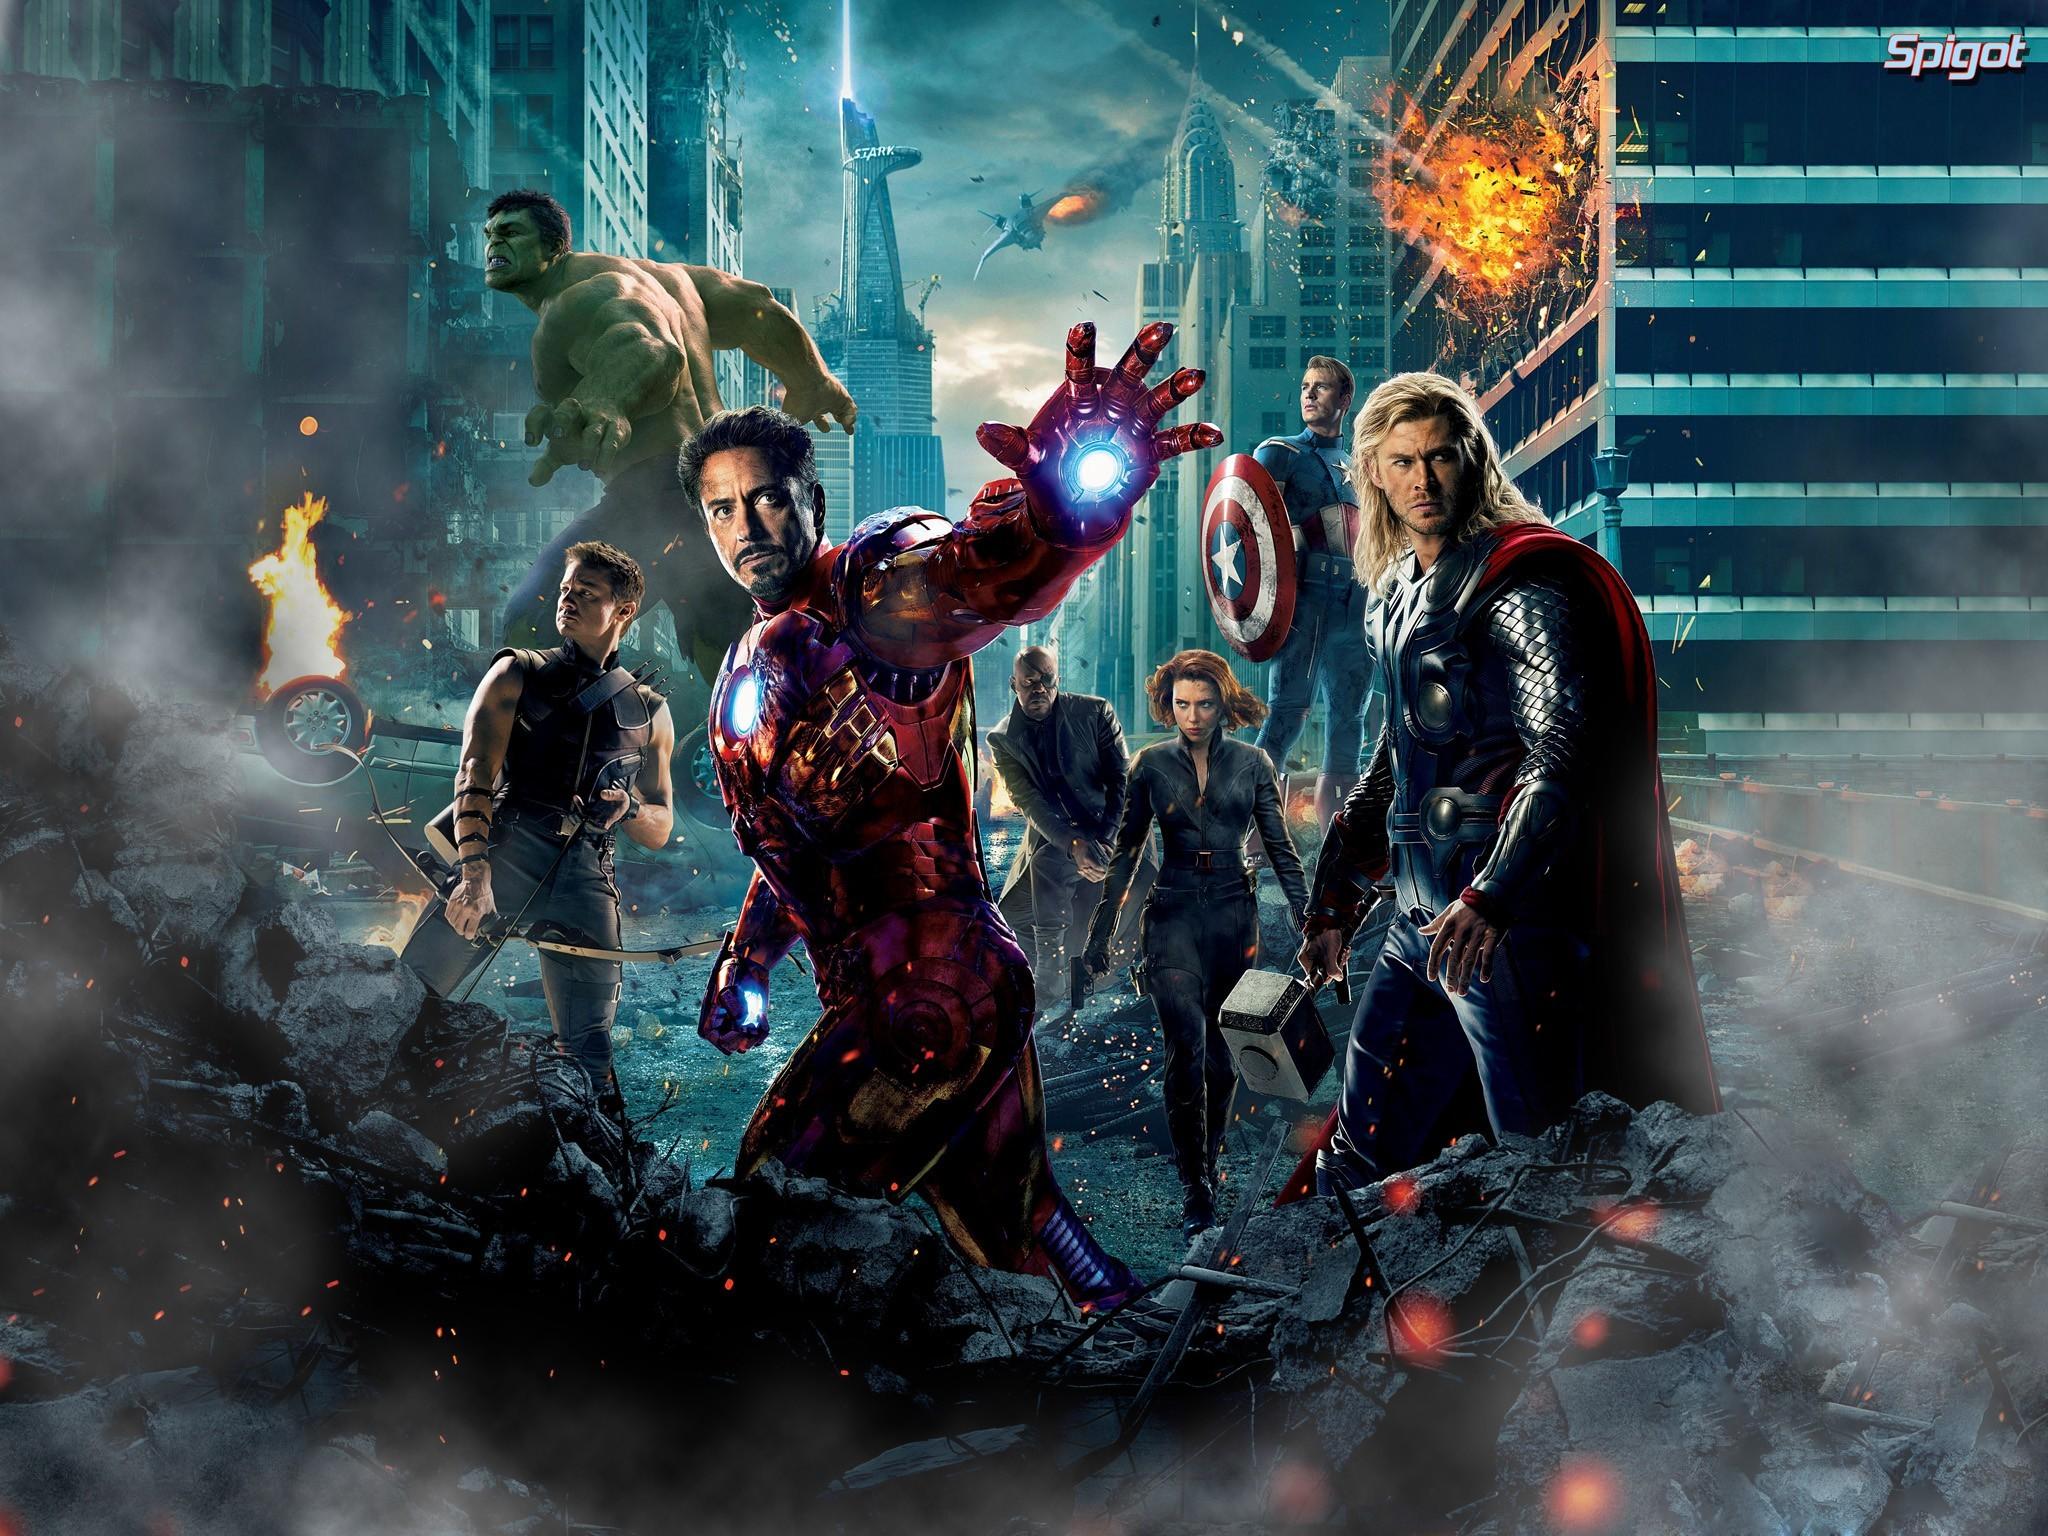 The Avengers Movie 2012 HD desktop wallpaper | The Avengers Movie 2012 HD  desktop wallpaper | Pinterest | Avengers wallpaper, Hd desktop and Avengers  movies